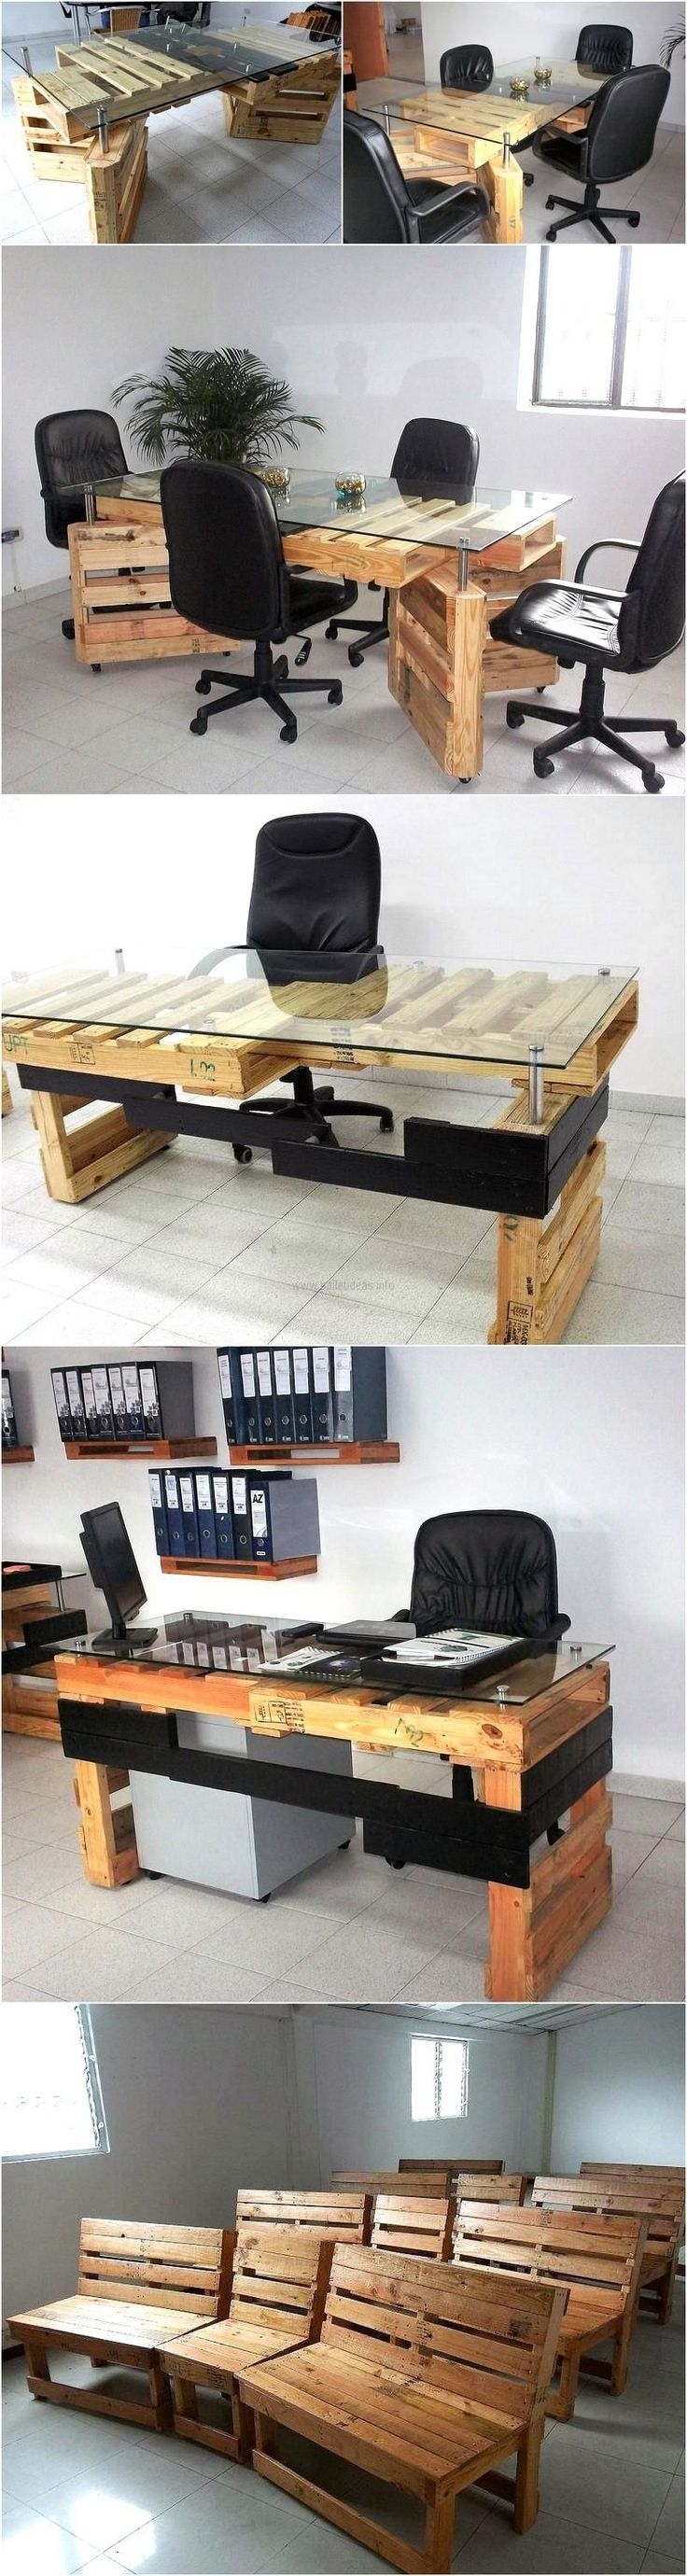 25 Best Ideas About Pallet Furniture Office On Pinterest